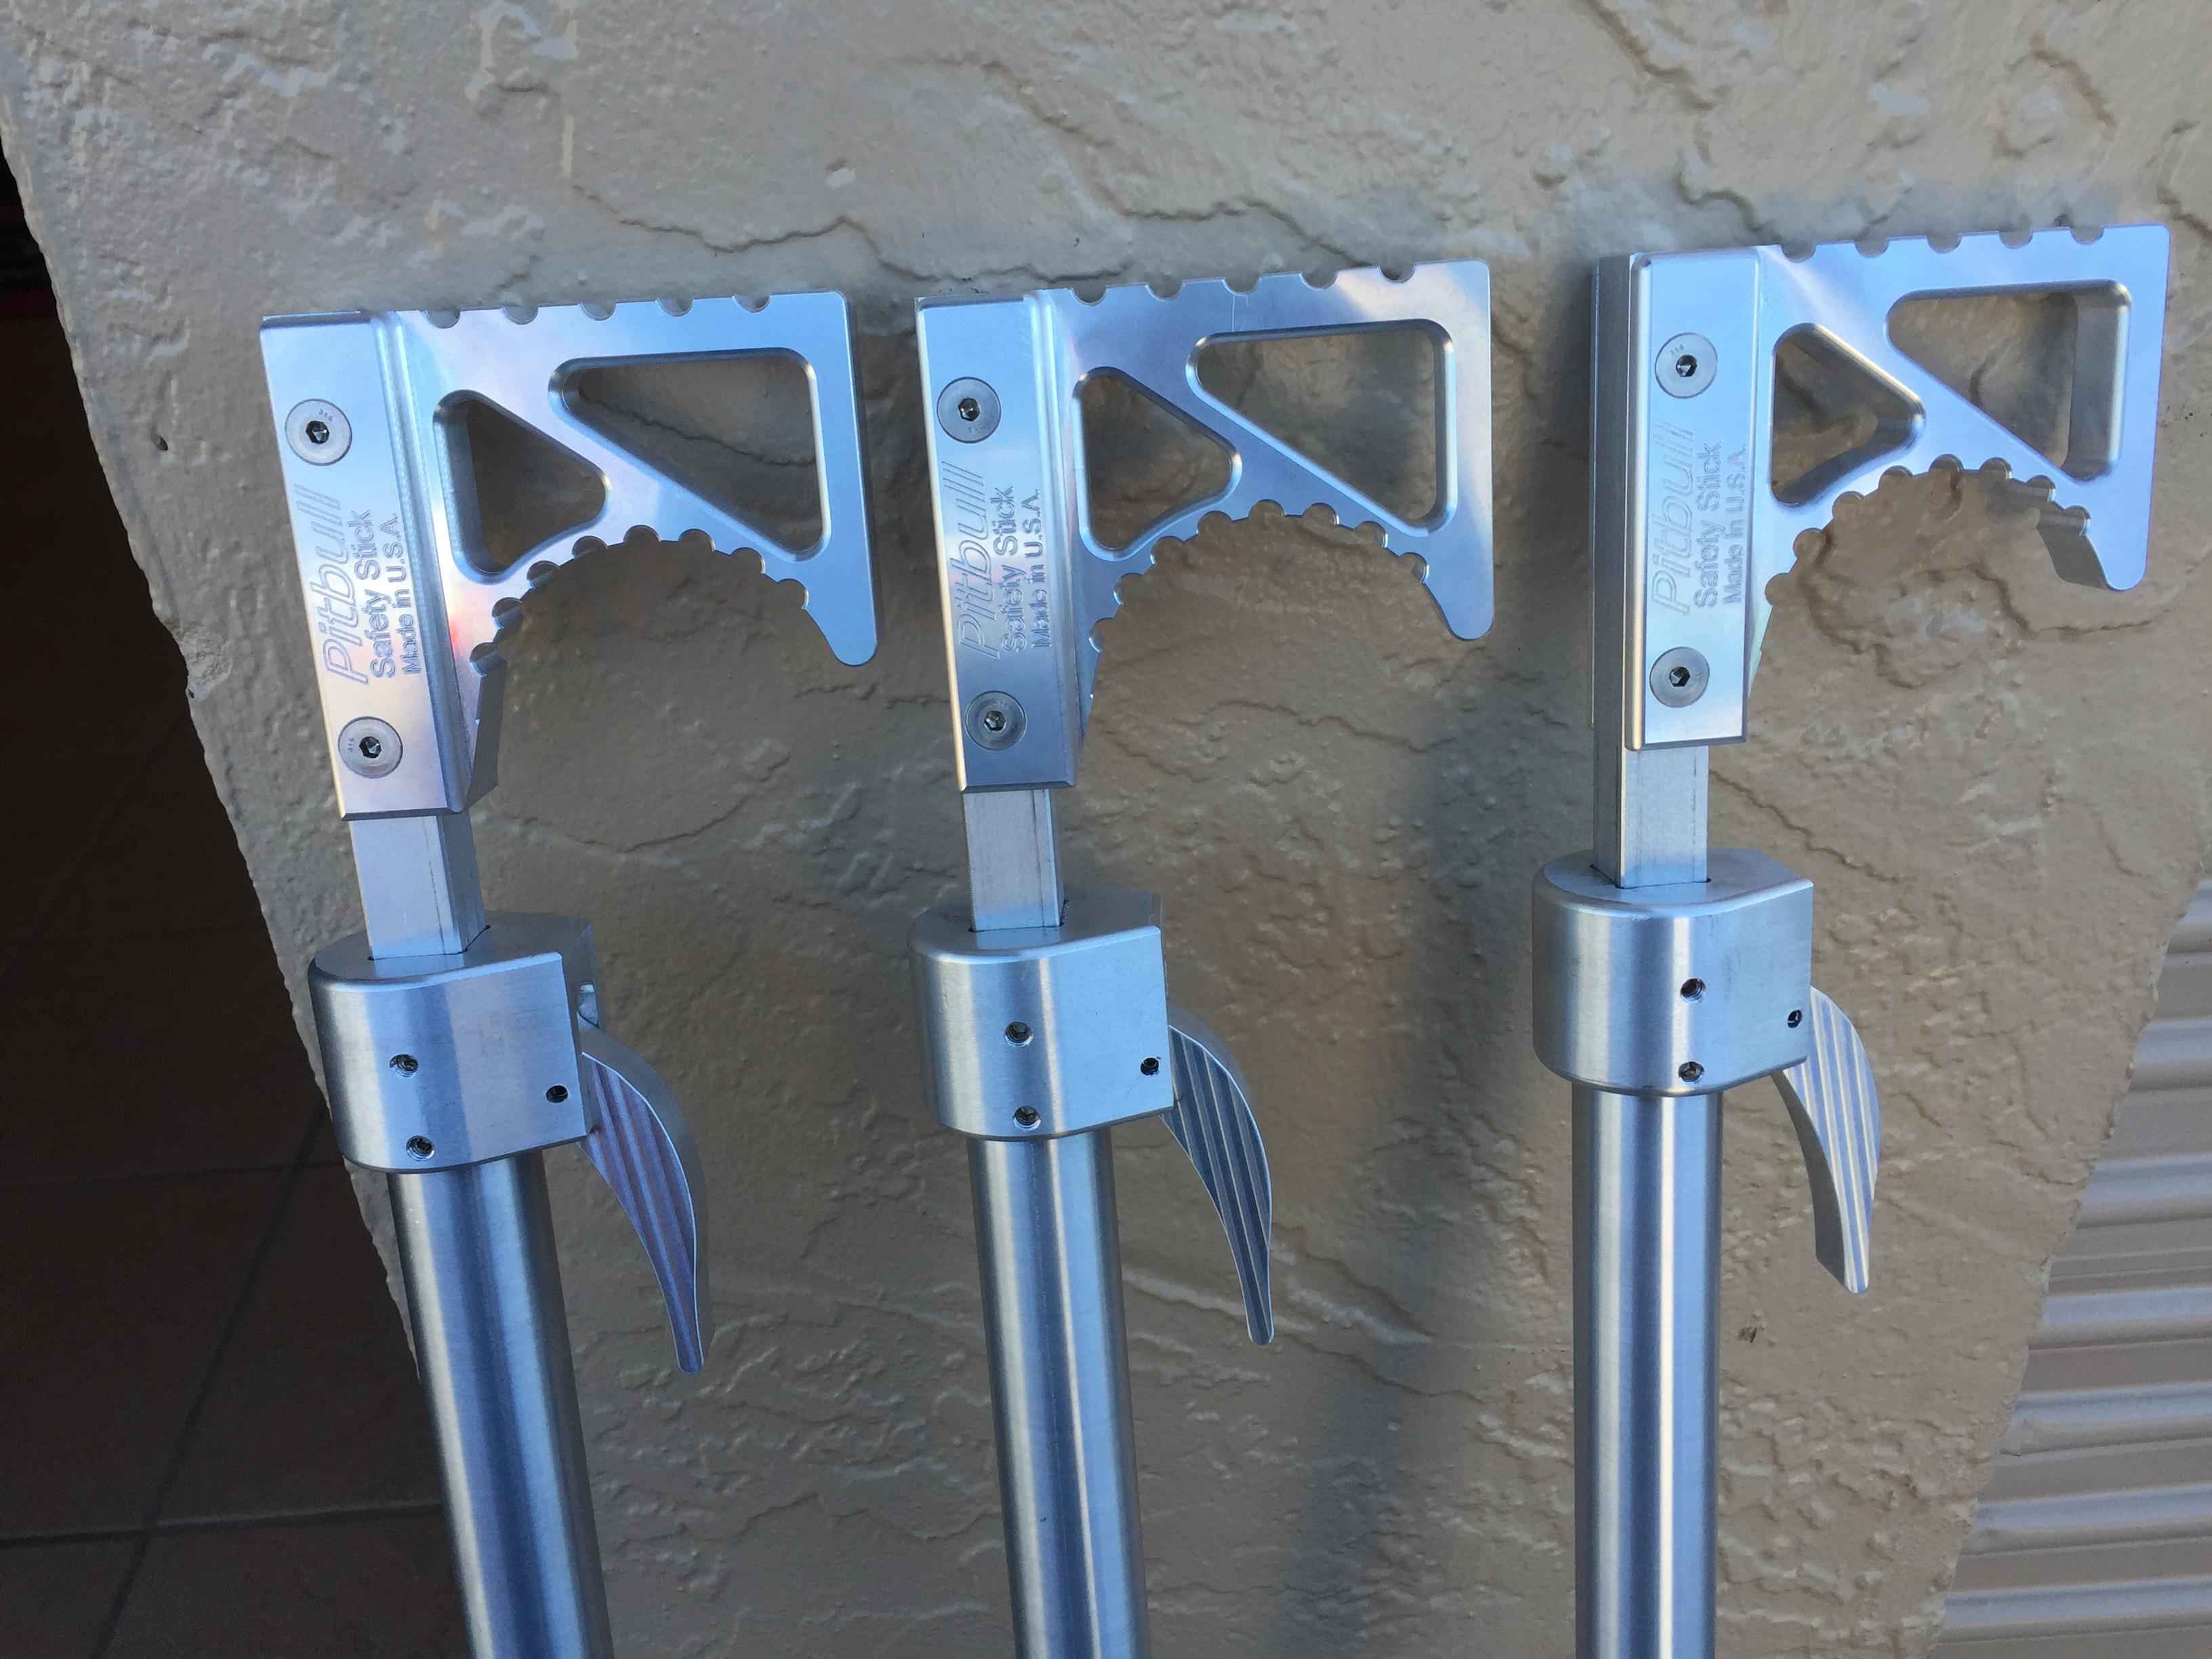 rr brakestick safety tool